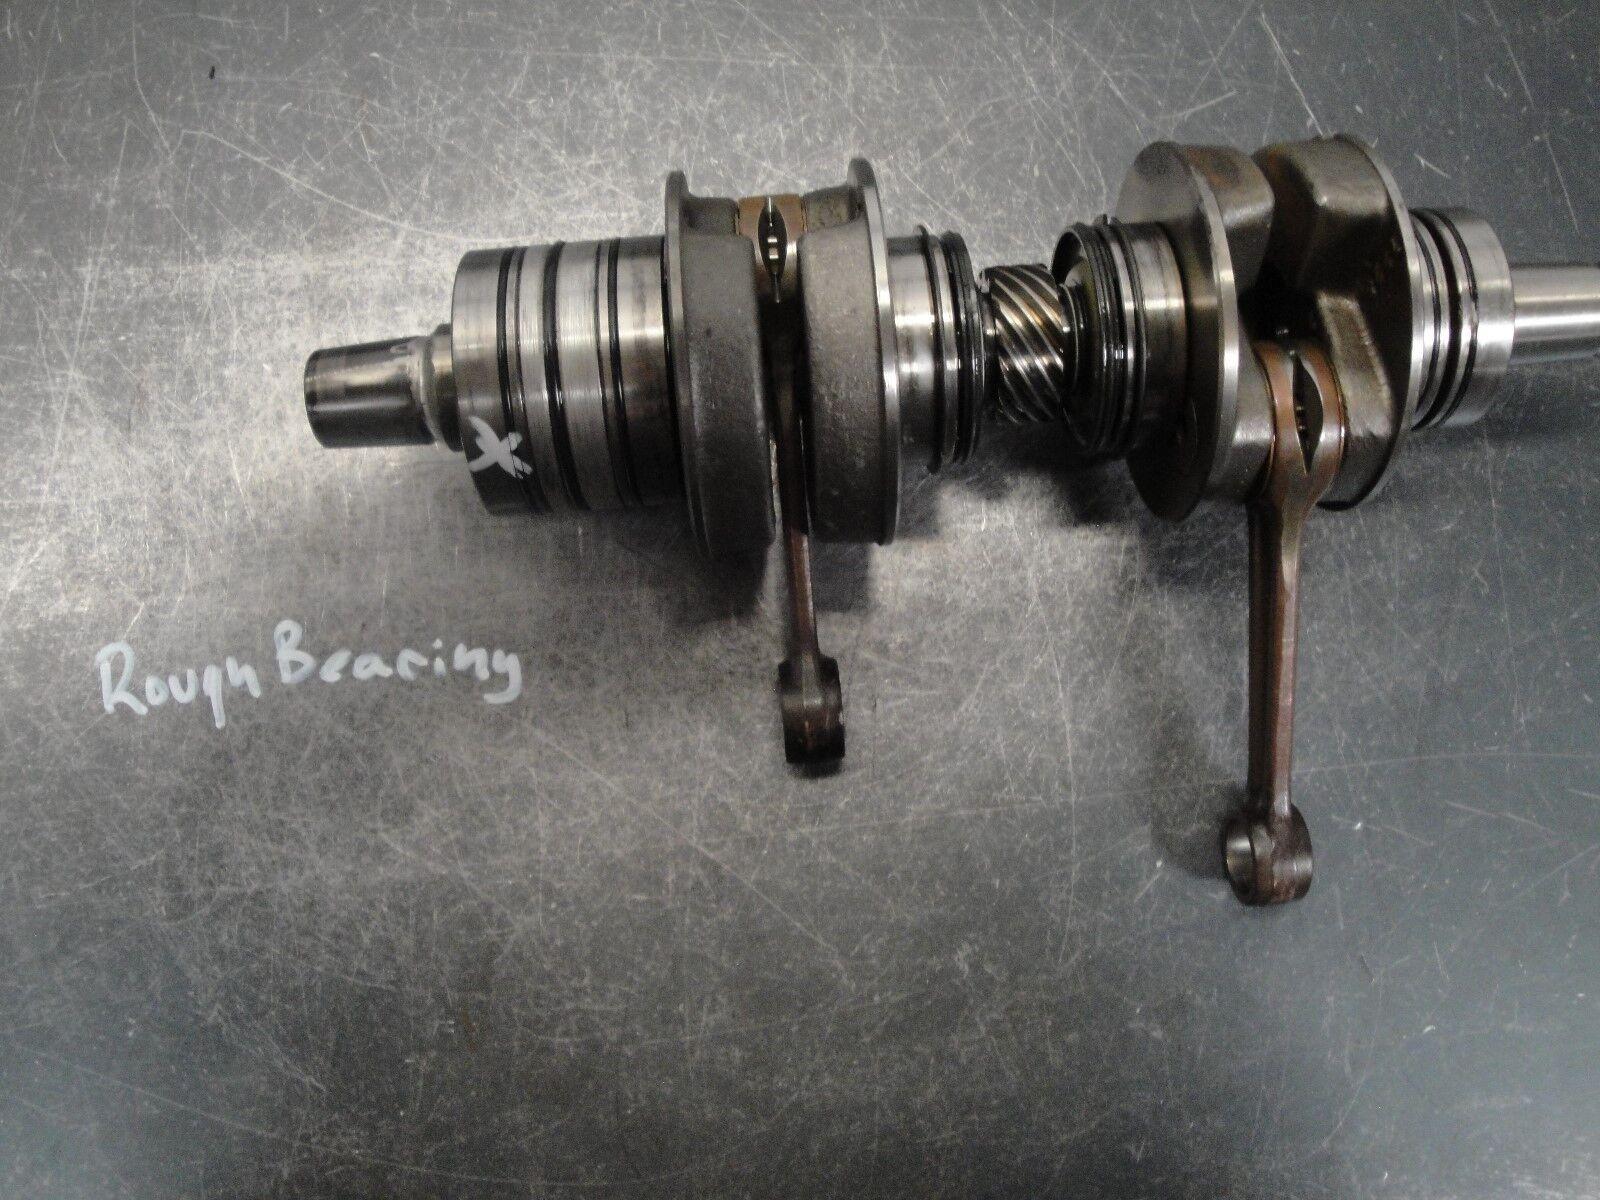 1996 96 SKIDOO SKI-DOO 583 MXZ X SNOWMOBILE ENGINE MOTOR CRANKSHAFT CRANK